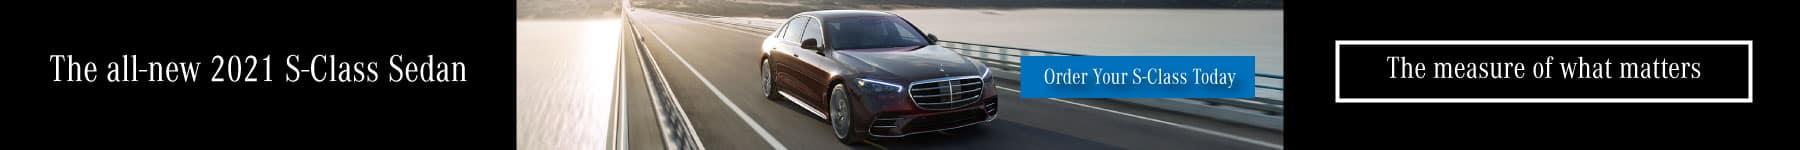 Mercedes-Benz of Lynnwood 2021 S-Class Sedan